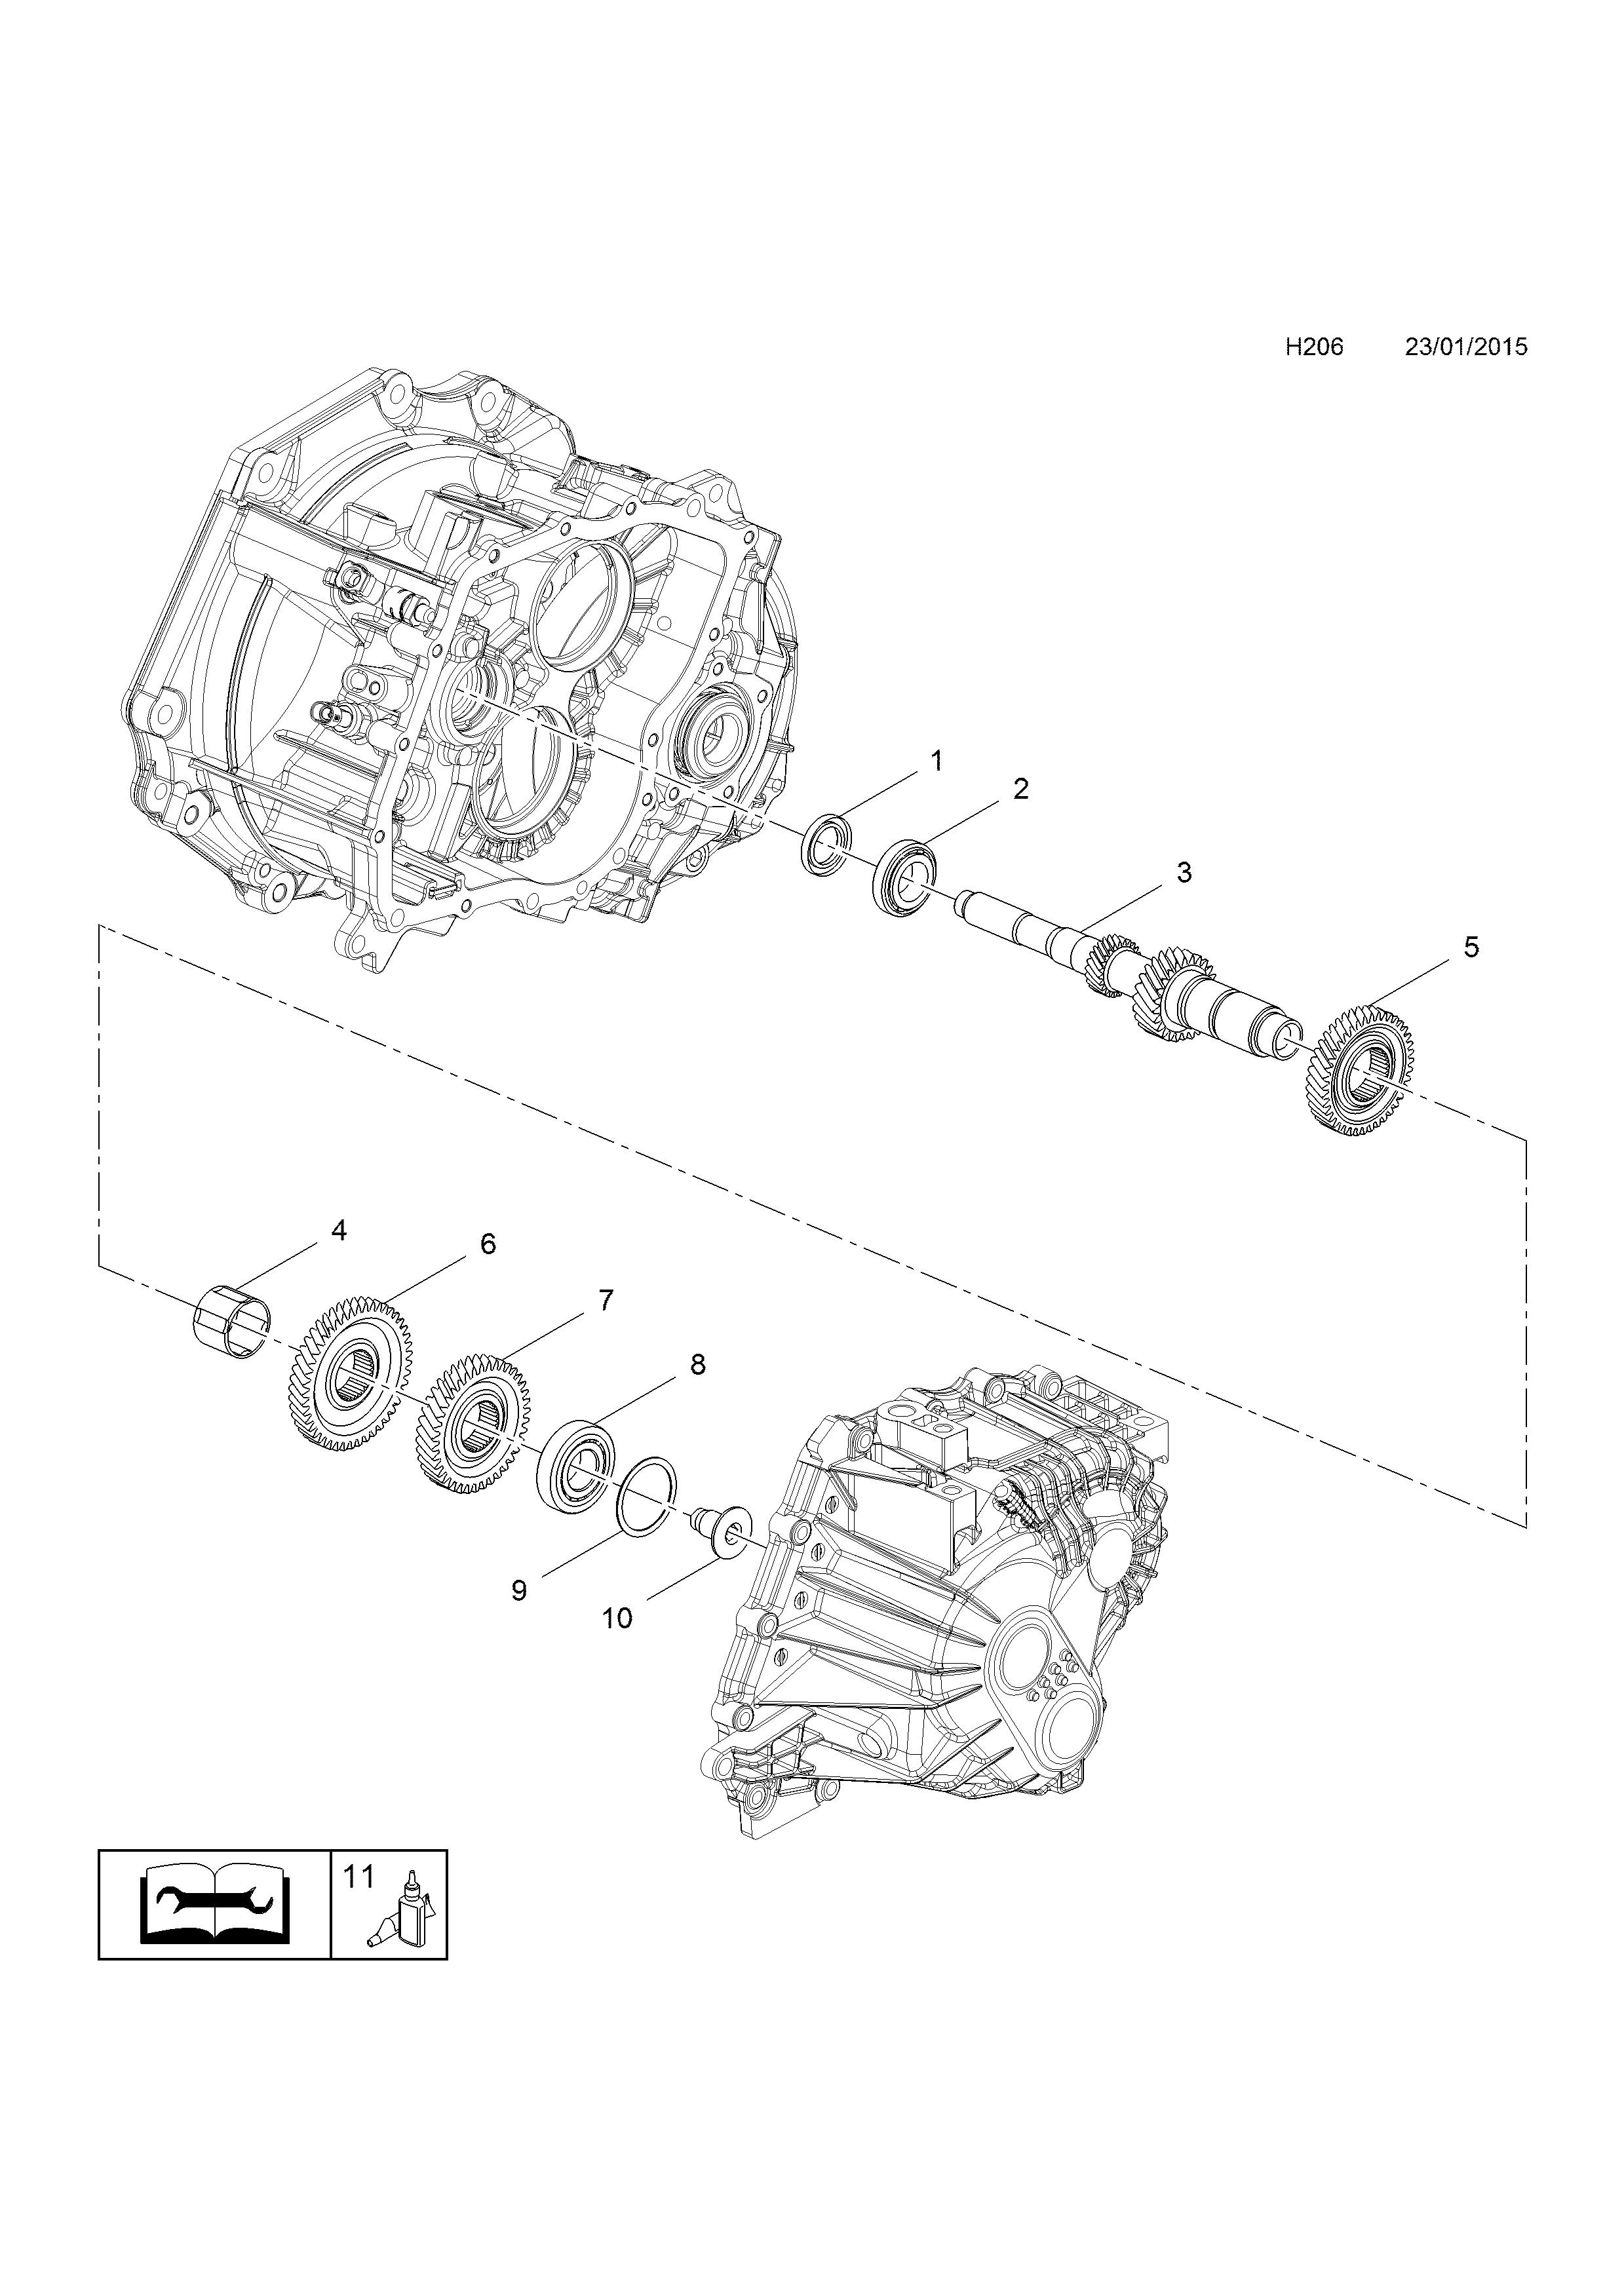 opel cascada 2013 h transmission 1 m32 manual transmission Chevy Front Differential Parts Diagram gm part number genuine part number description range